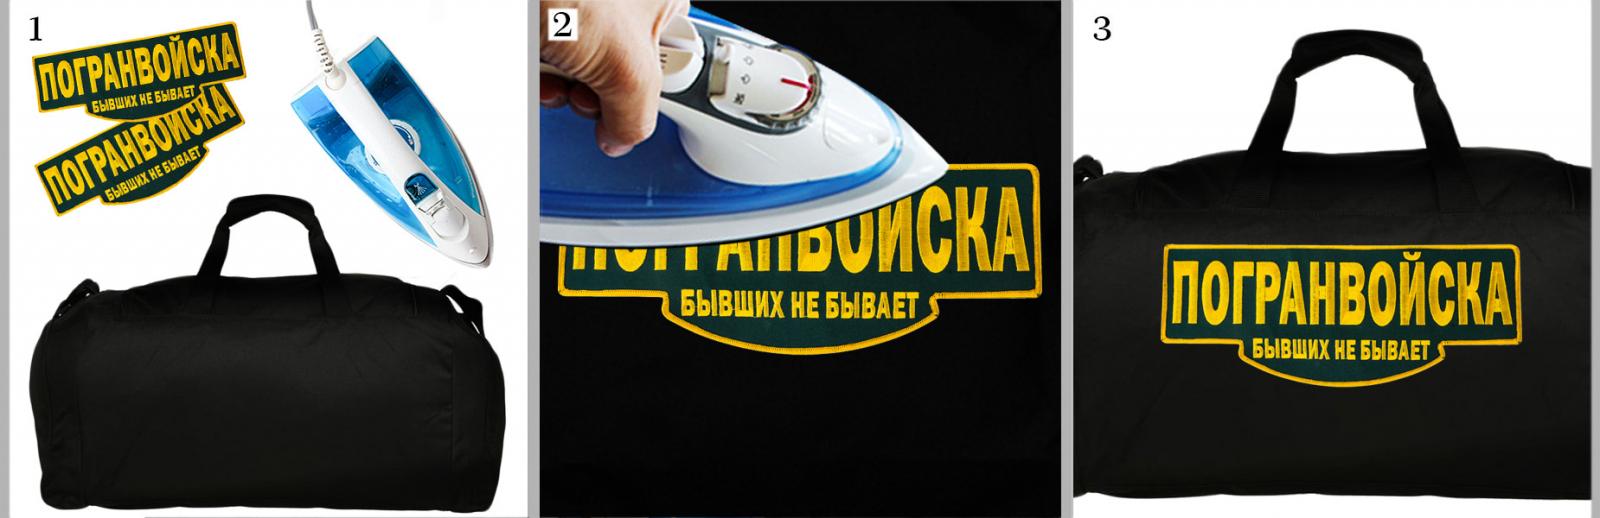 "Термонашивка на одежду ""Погранвойска"" на сумке"